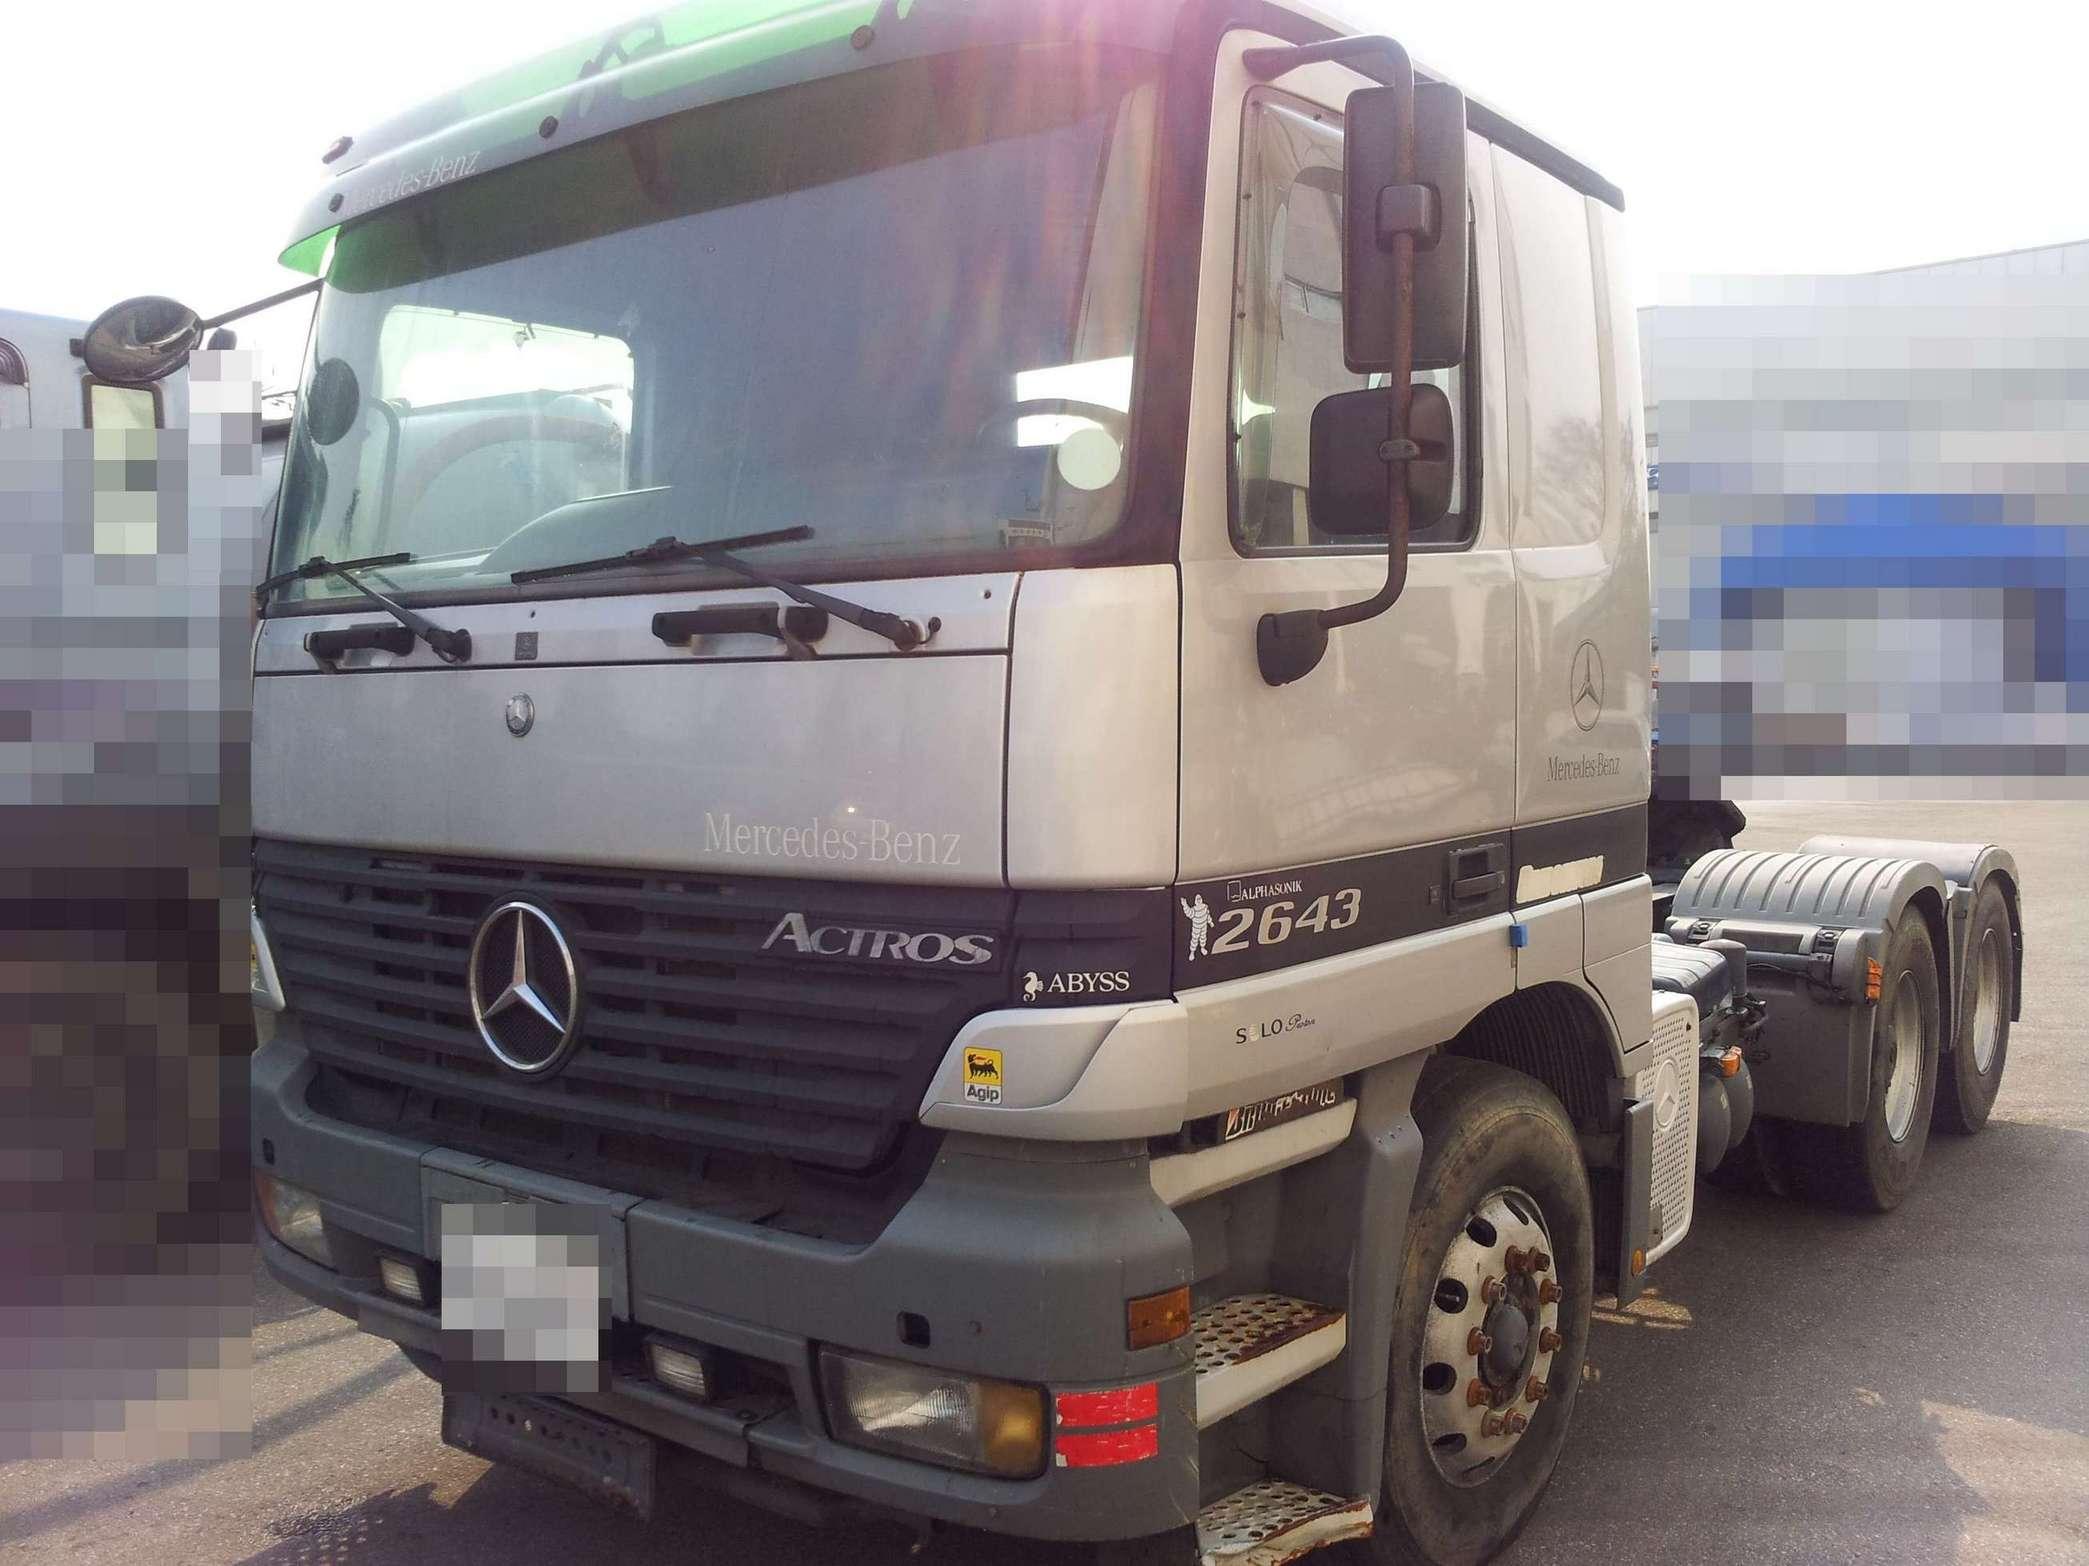 Mercedes benz actros tractor head truck 2643 buy for Mercedes benz of hilton head